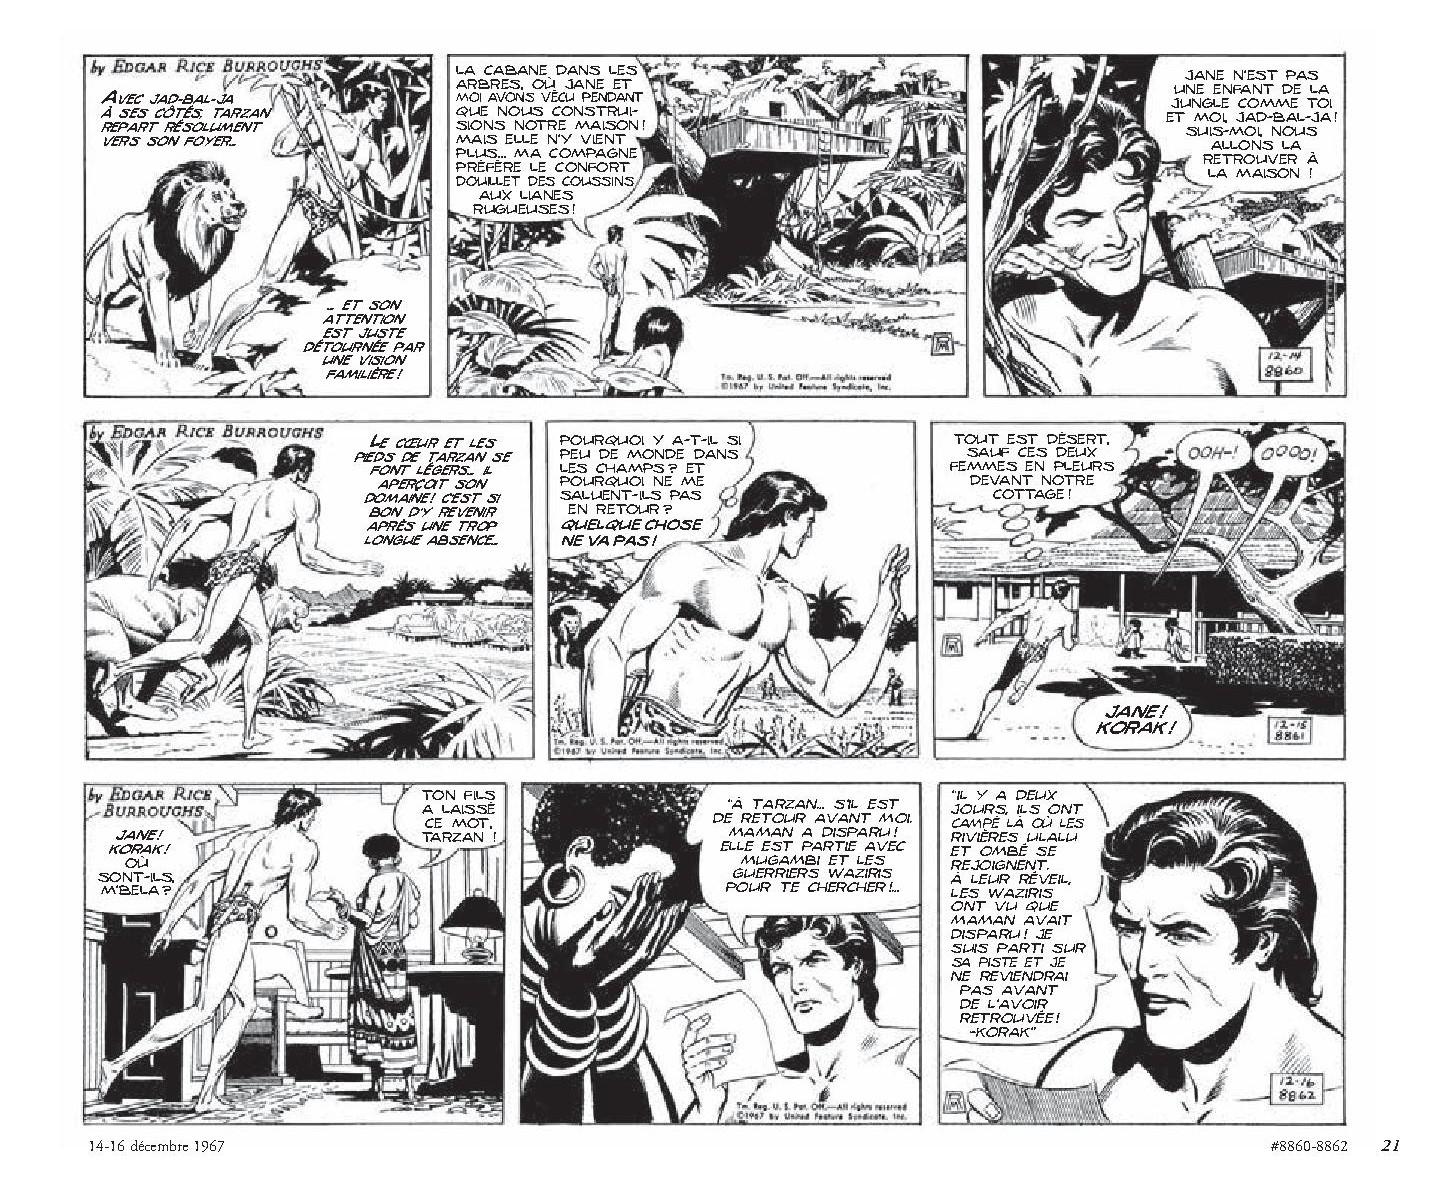 Tarzan _ intégrale Russ Manning newspaper strips _ Tome 1, 1967-1969-3